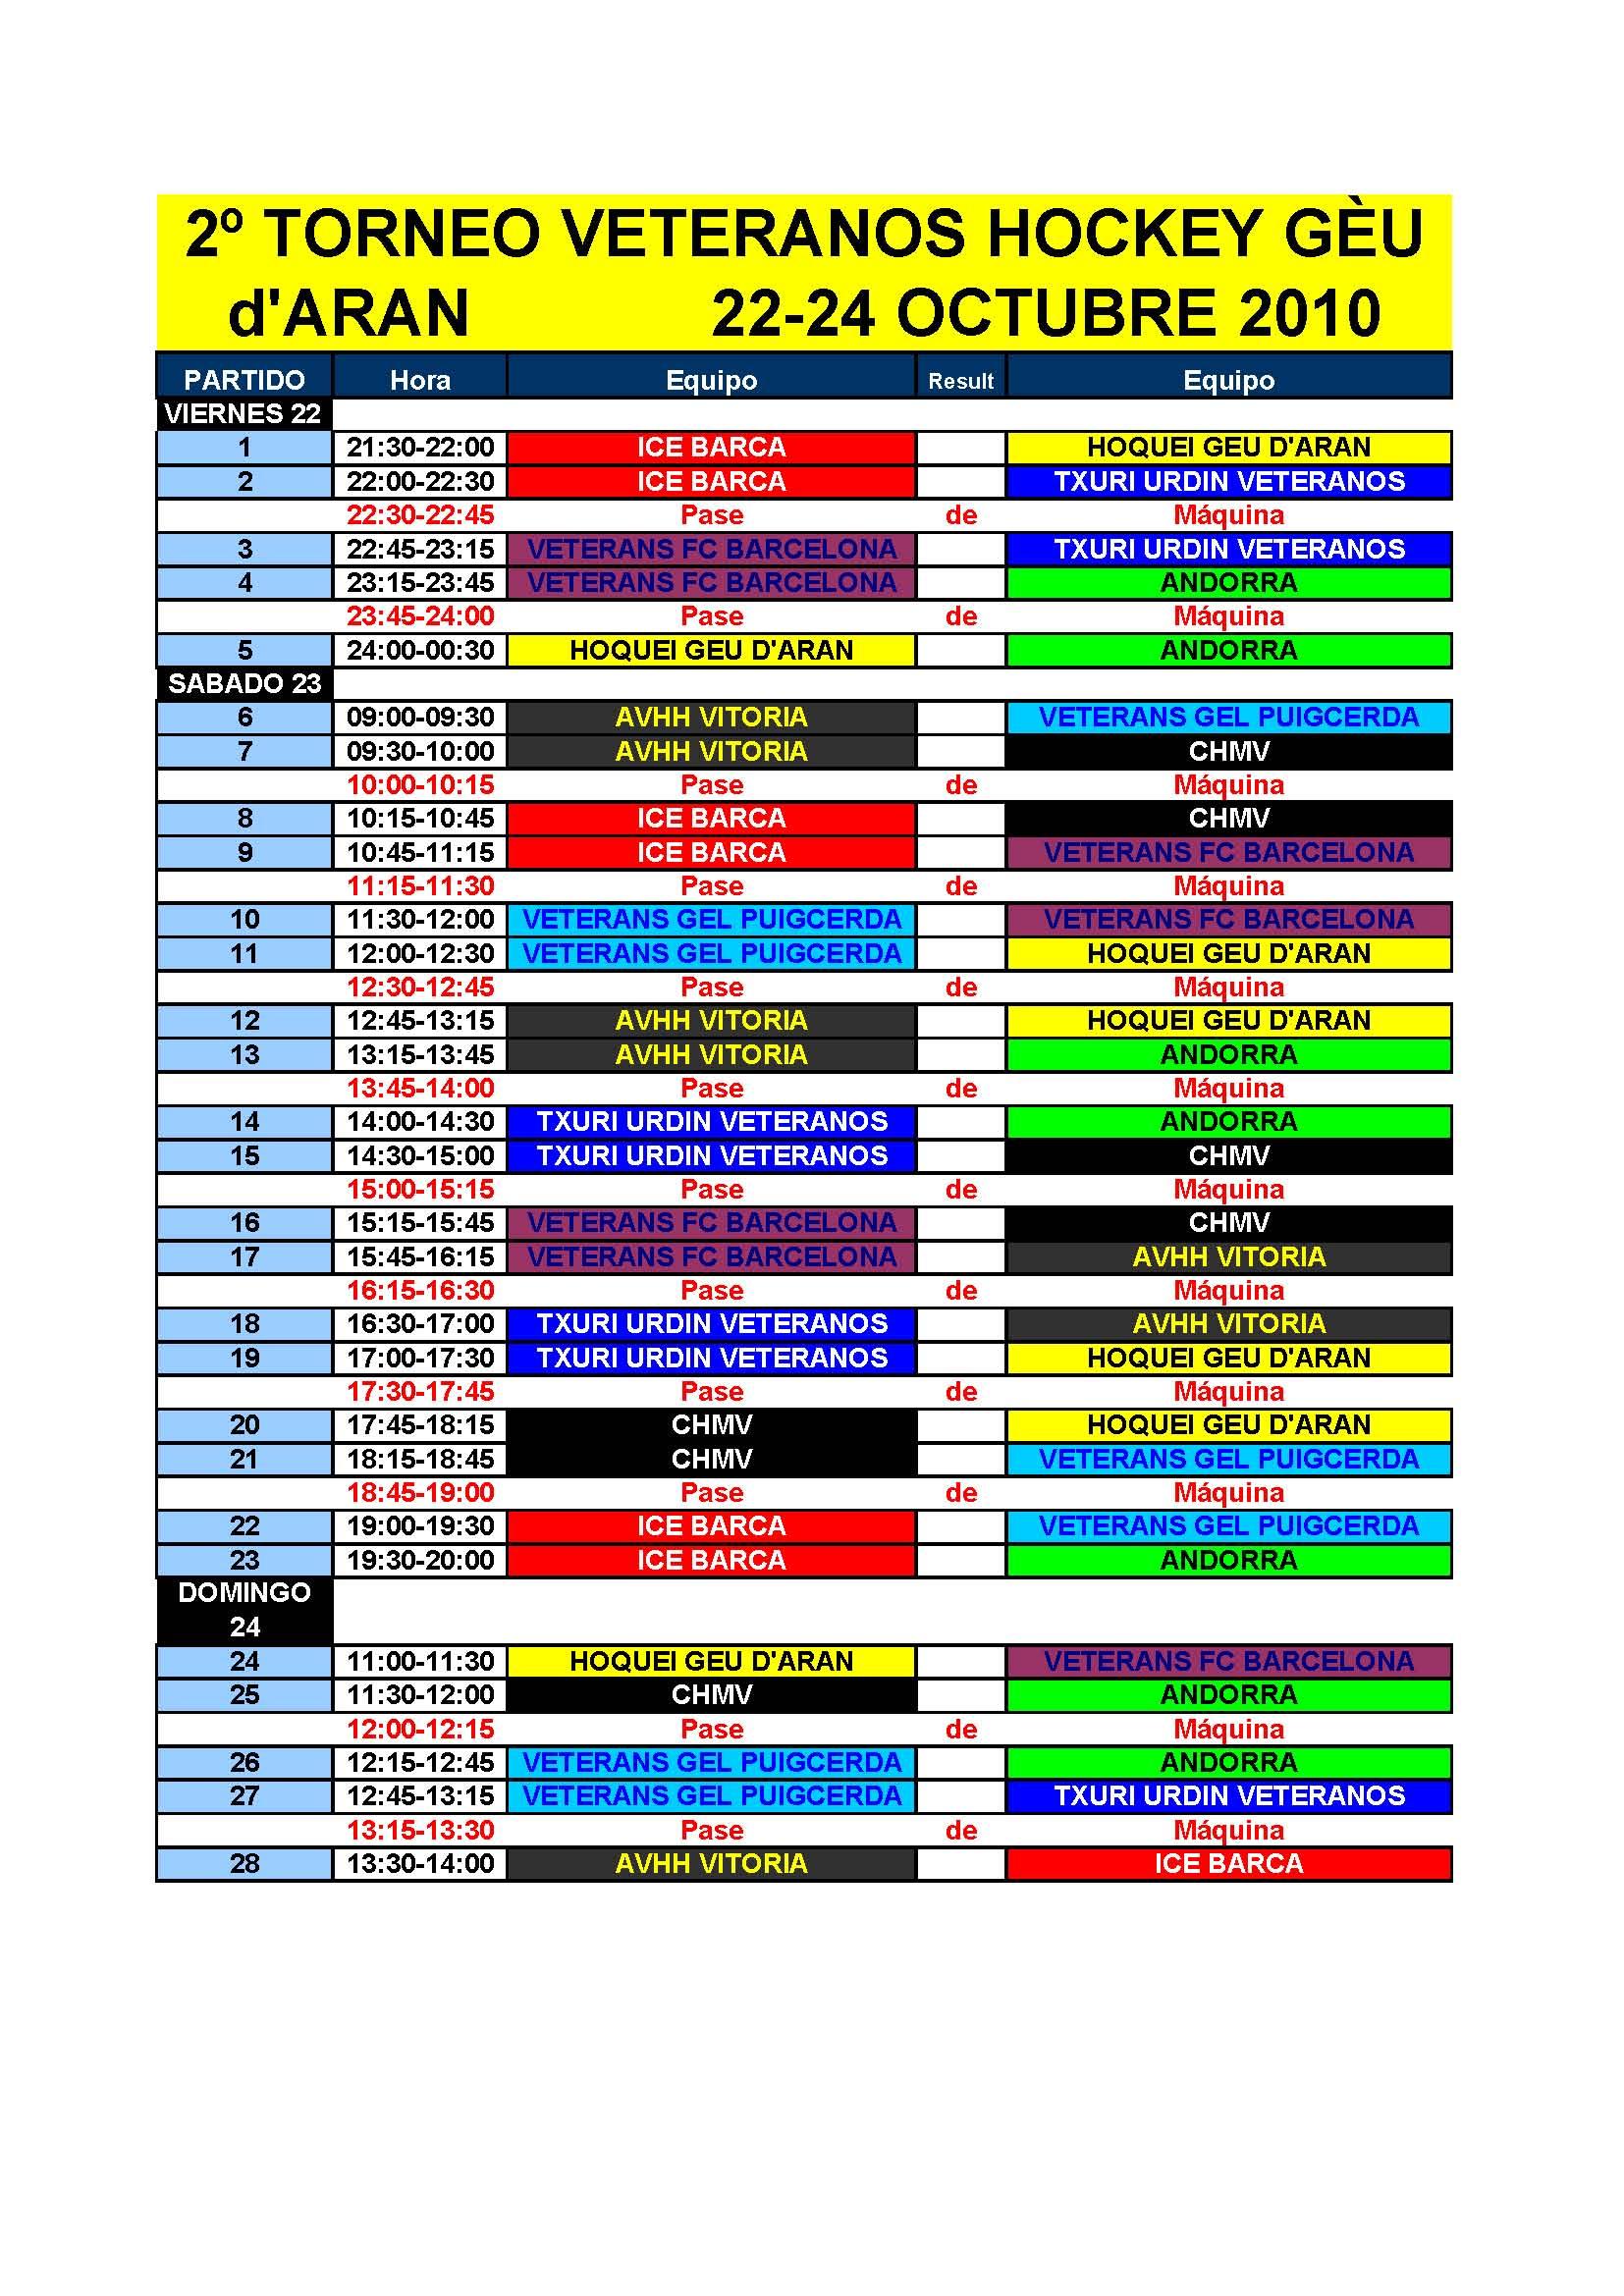 Calendario del torneo